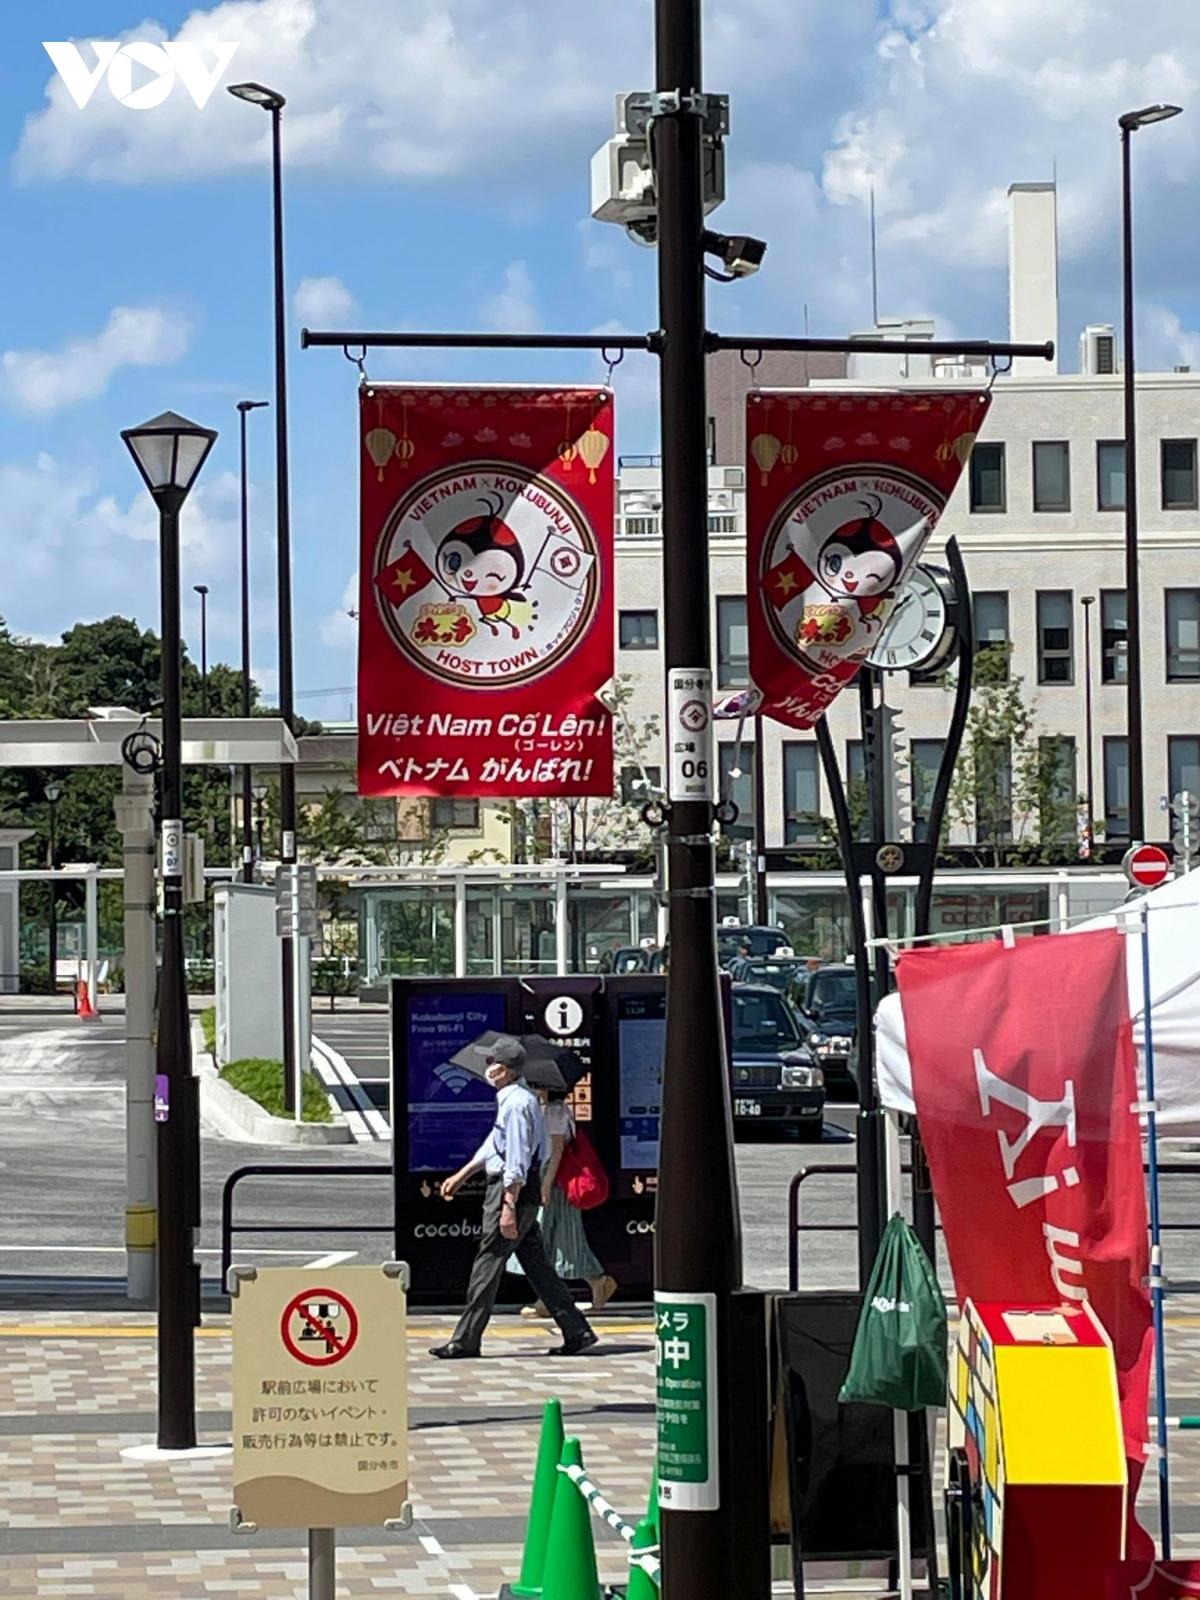 Japanese City Promotes Vietnam Ahead of Paralympics